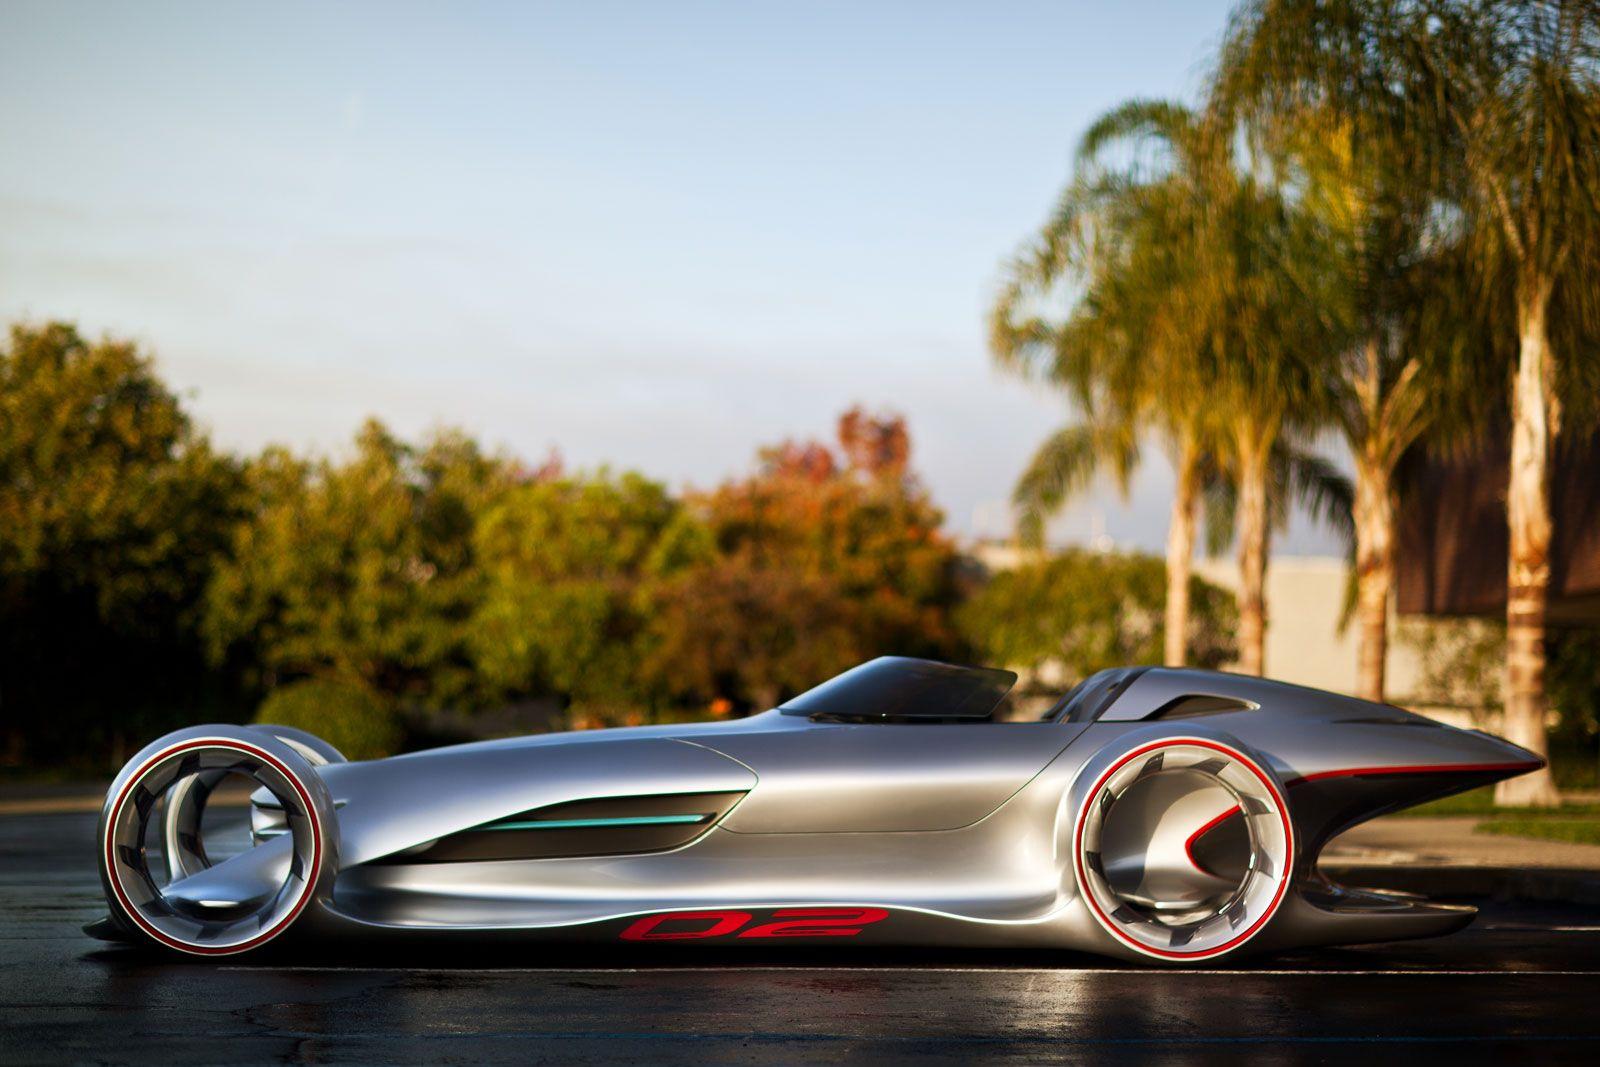 La Design Challenge 2011 Mercedes Benz Silver Arrow Concept Concept Cars Futuristic Cars Expensive Cars